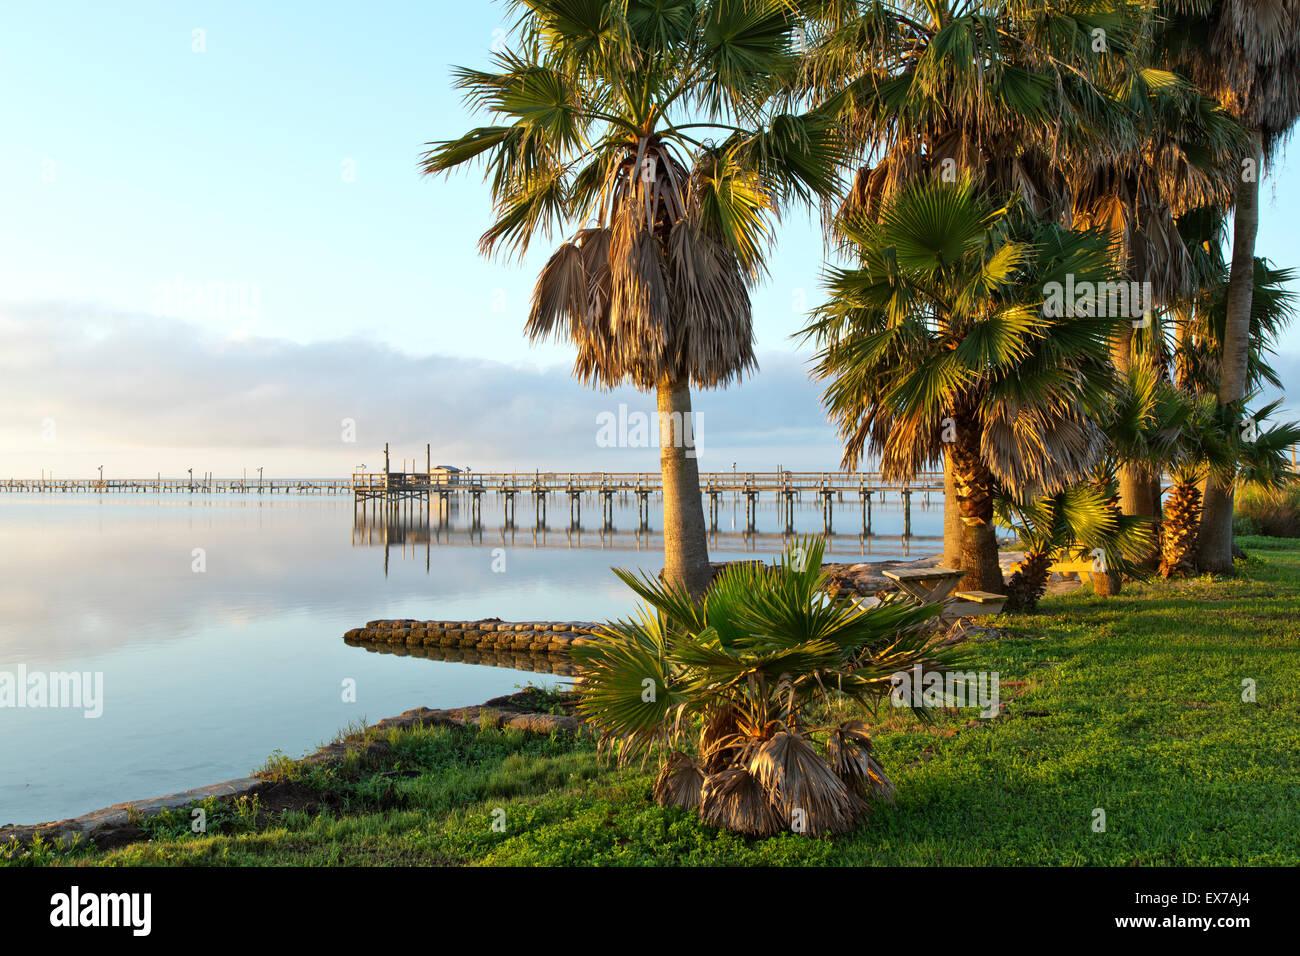 Fishing Pier, palm trees bordering Aransas Bay. - Stock Image